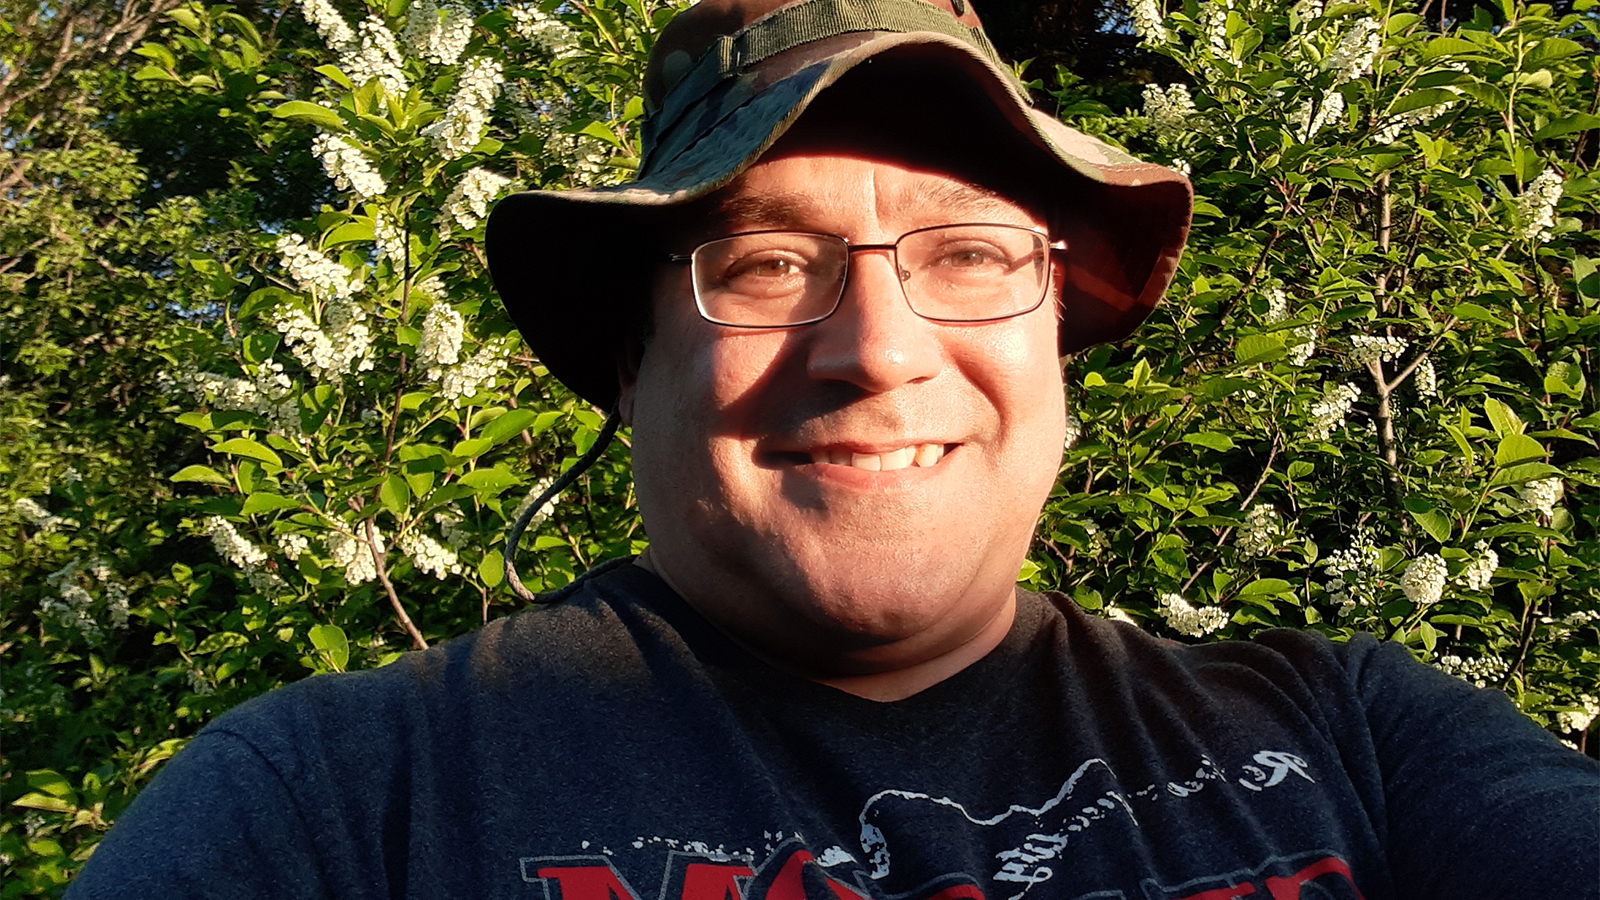 Mario Doiron selfie